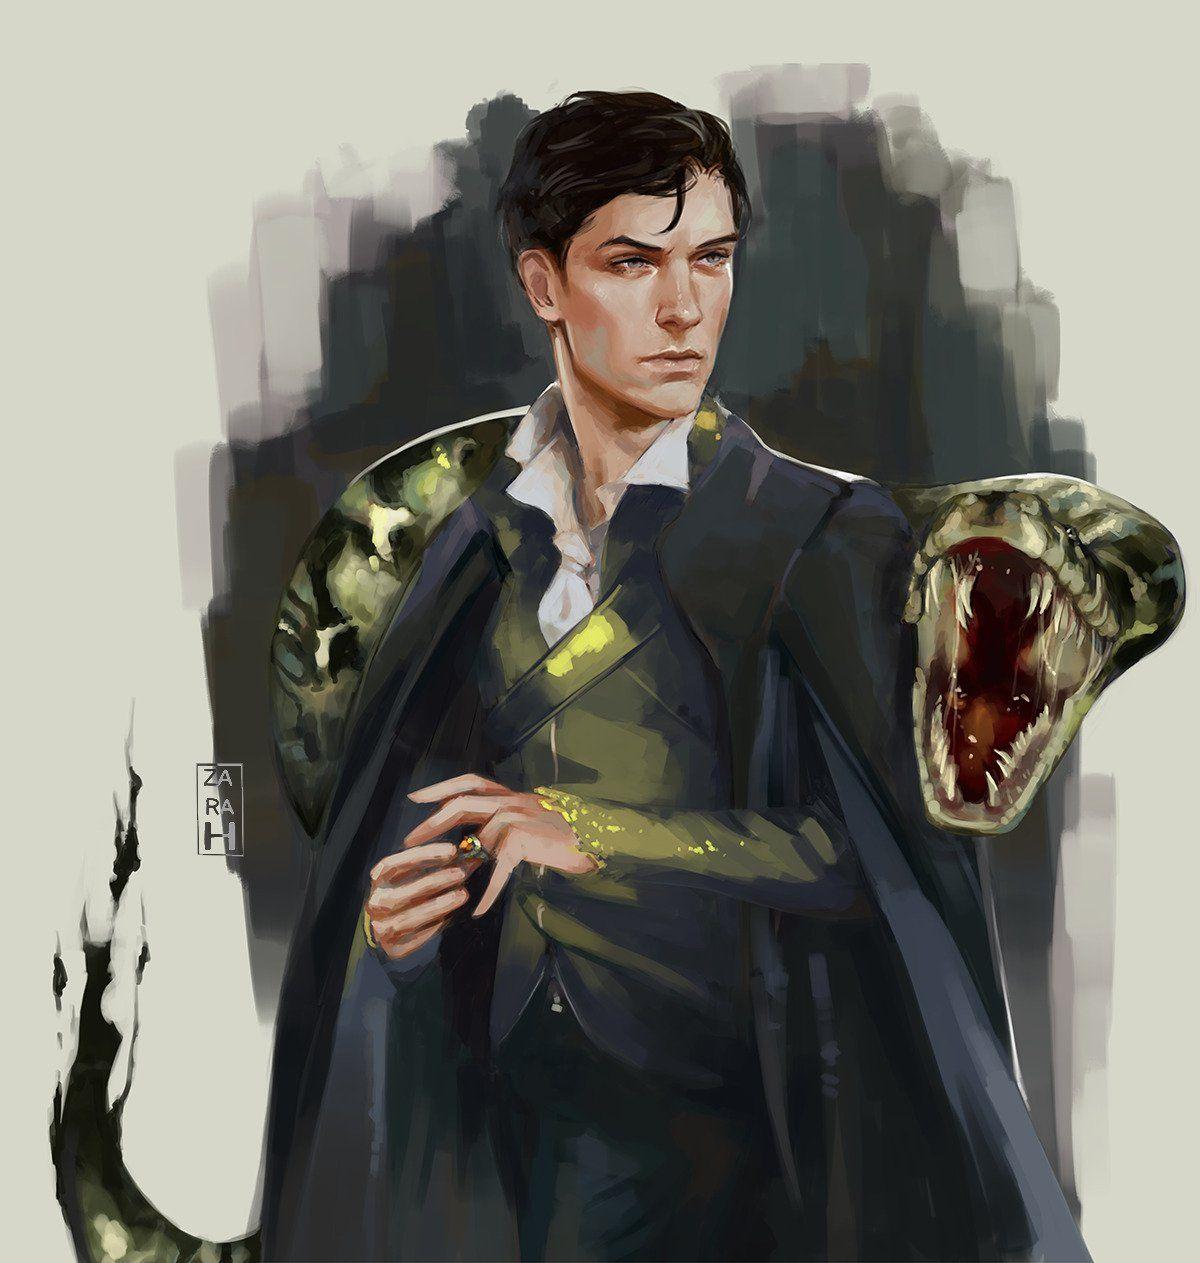 One of the best Tom Riddle's fan art. harrypotter in